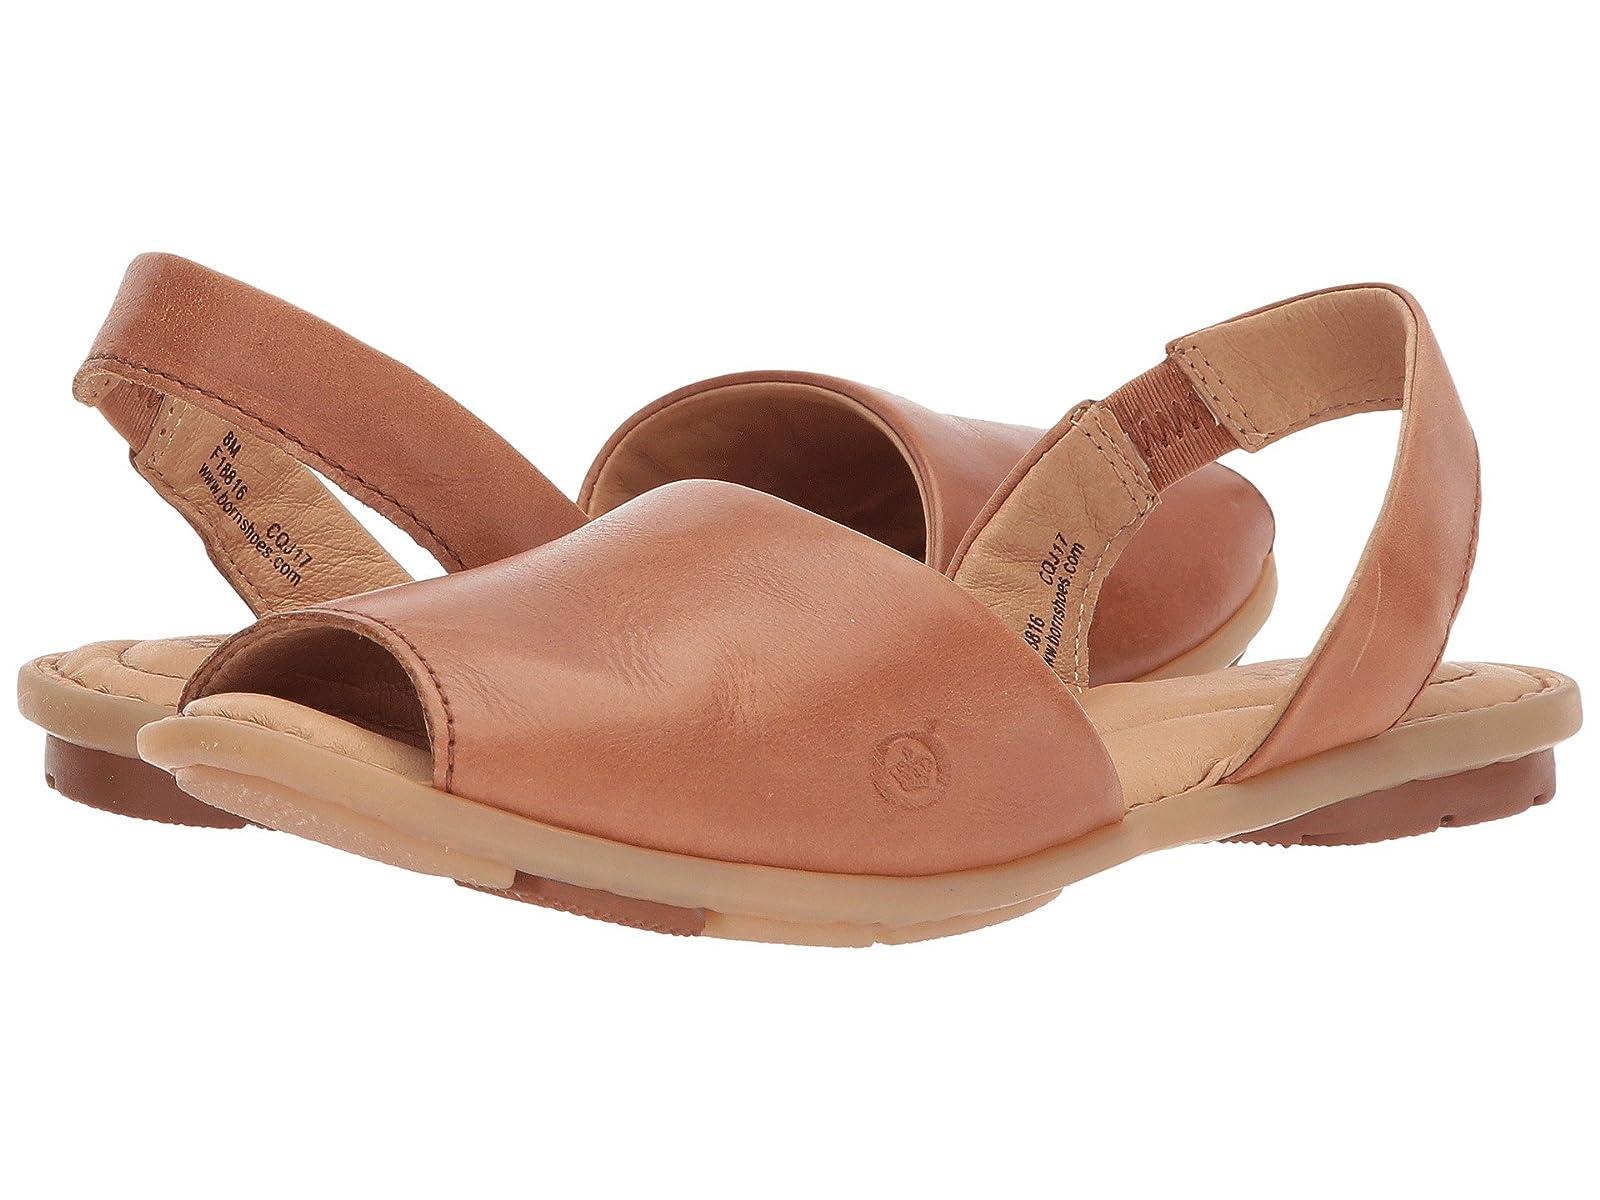 Born TrangComfortable and distinctive shoes